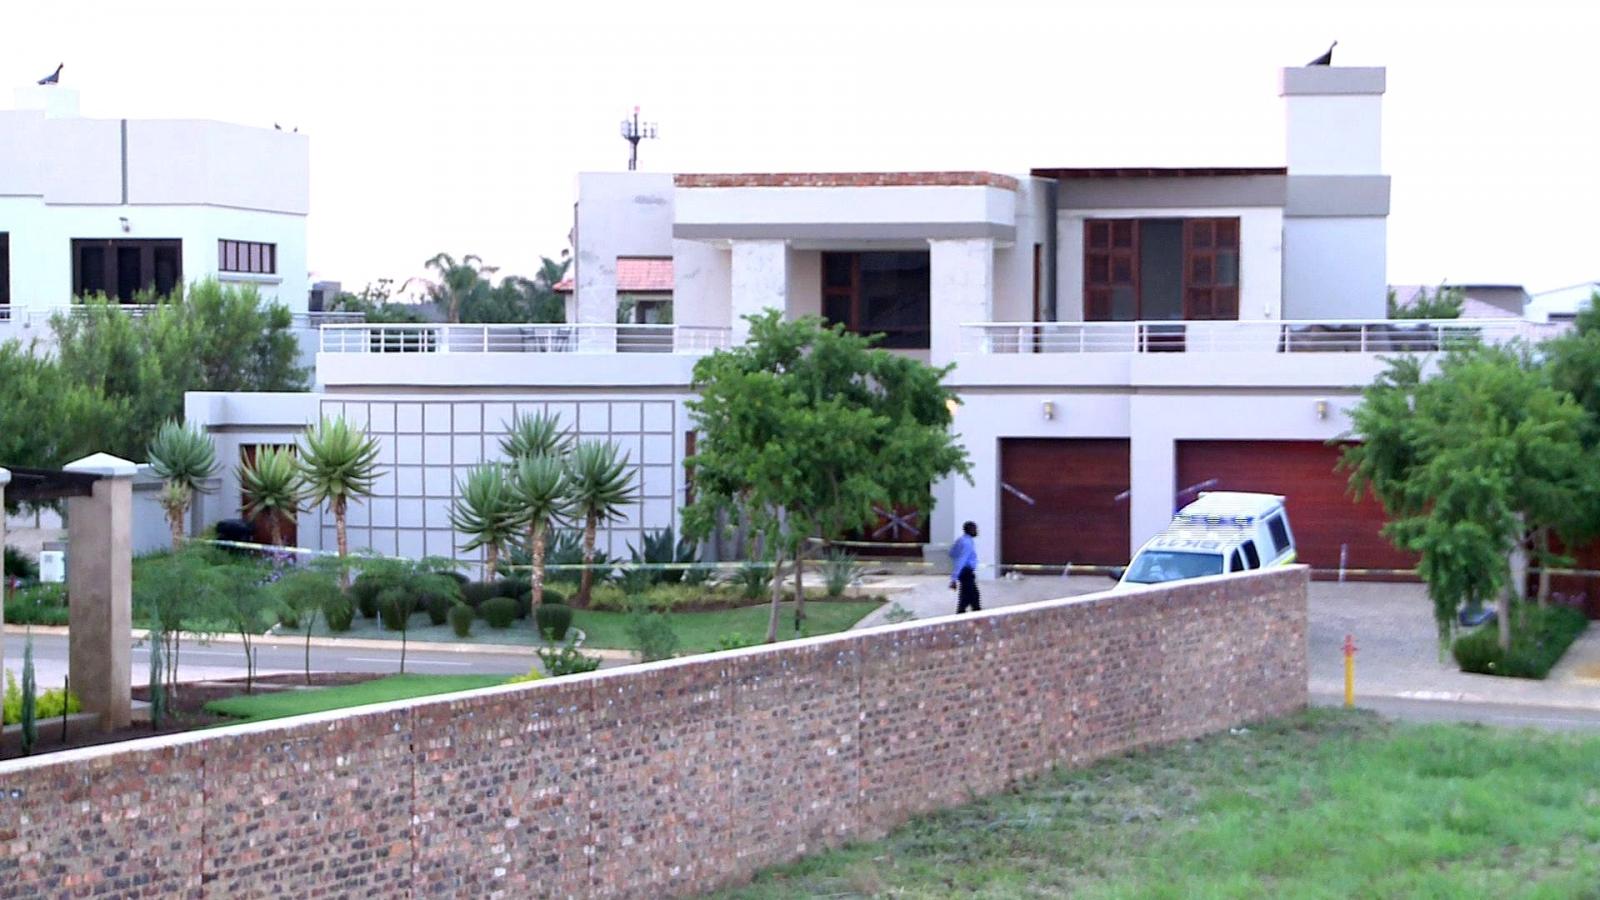 Cash Strapped Oscar Pistorius Sells Home Where He Shot